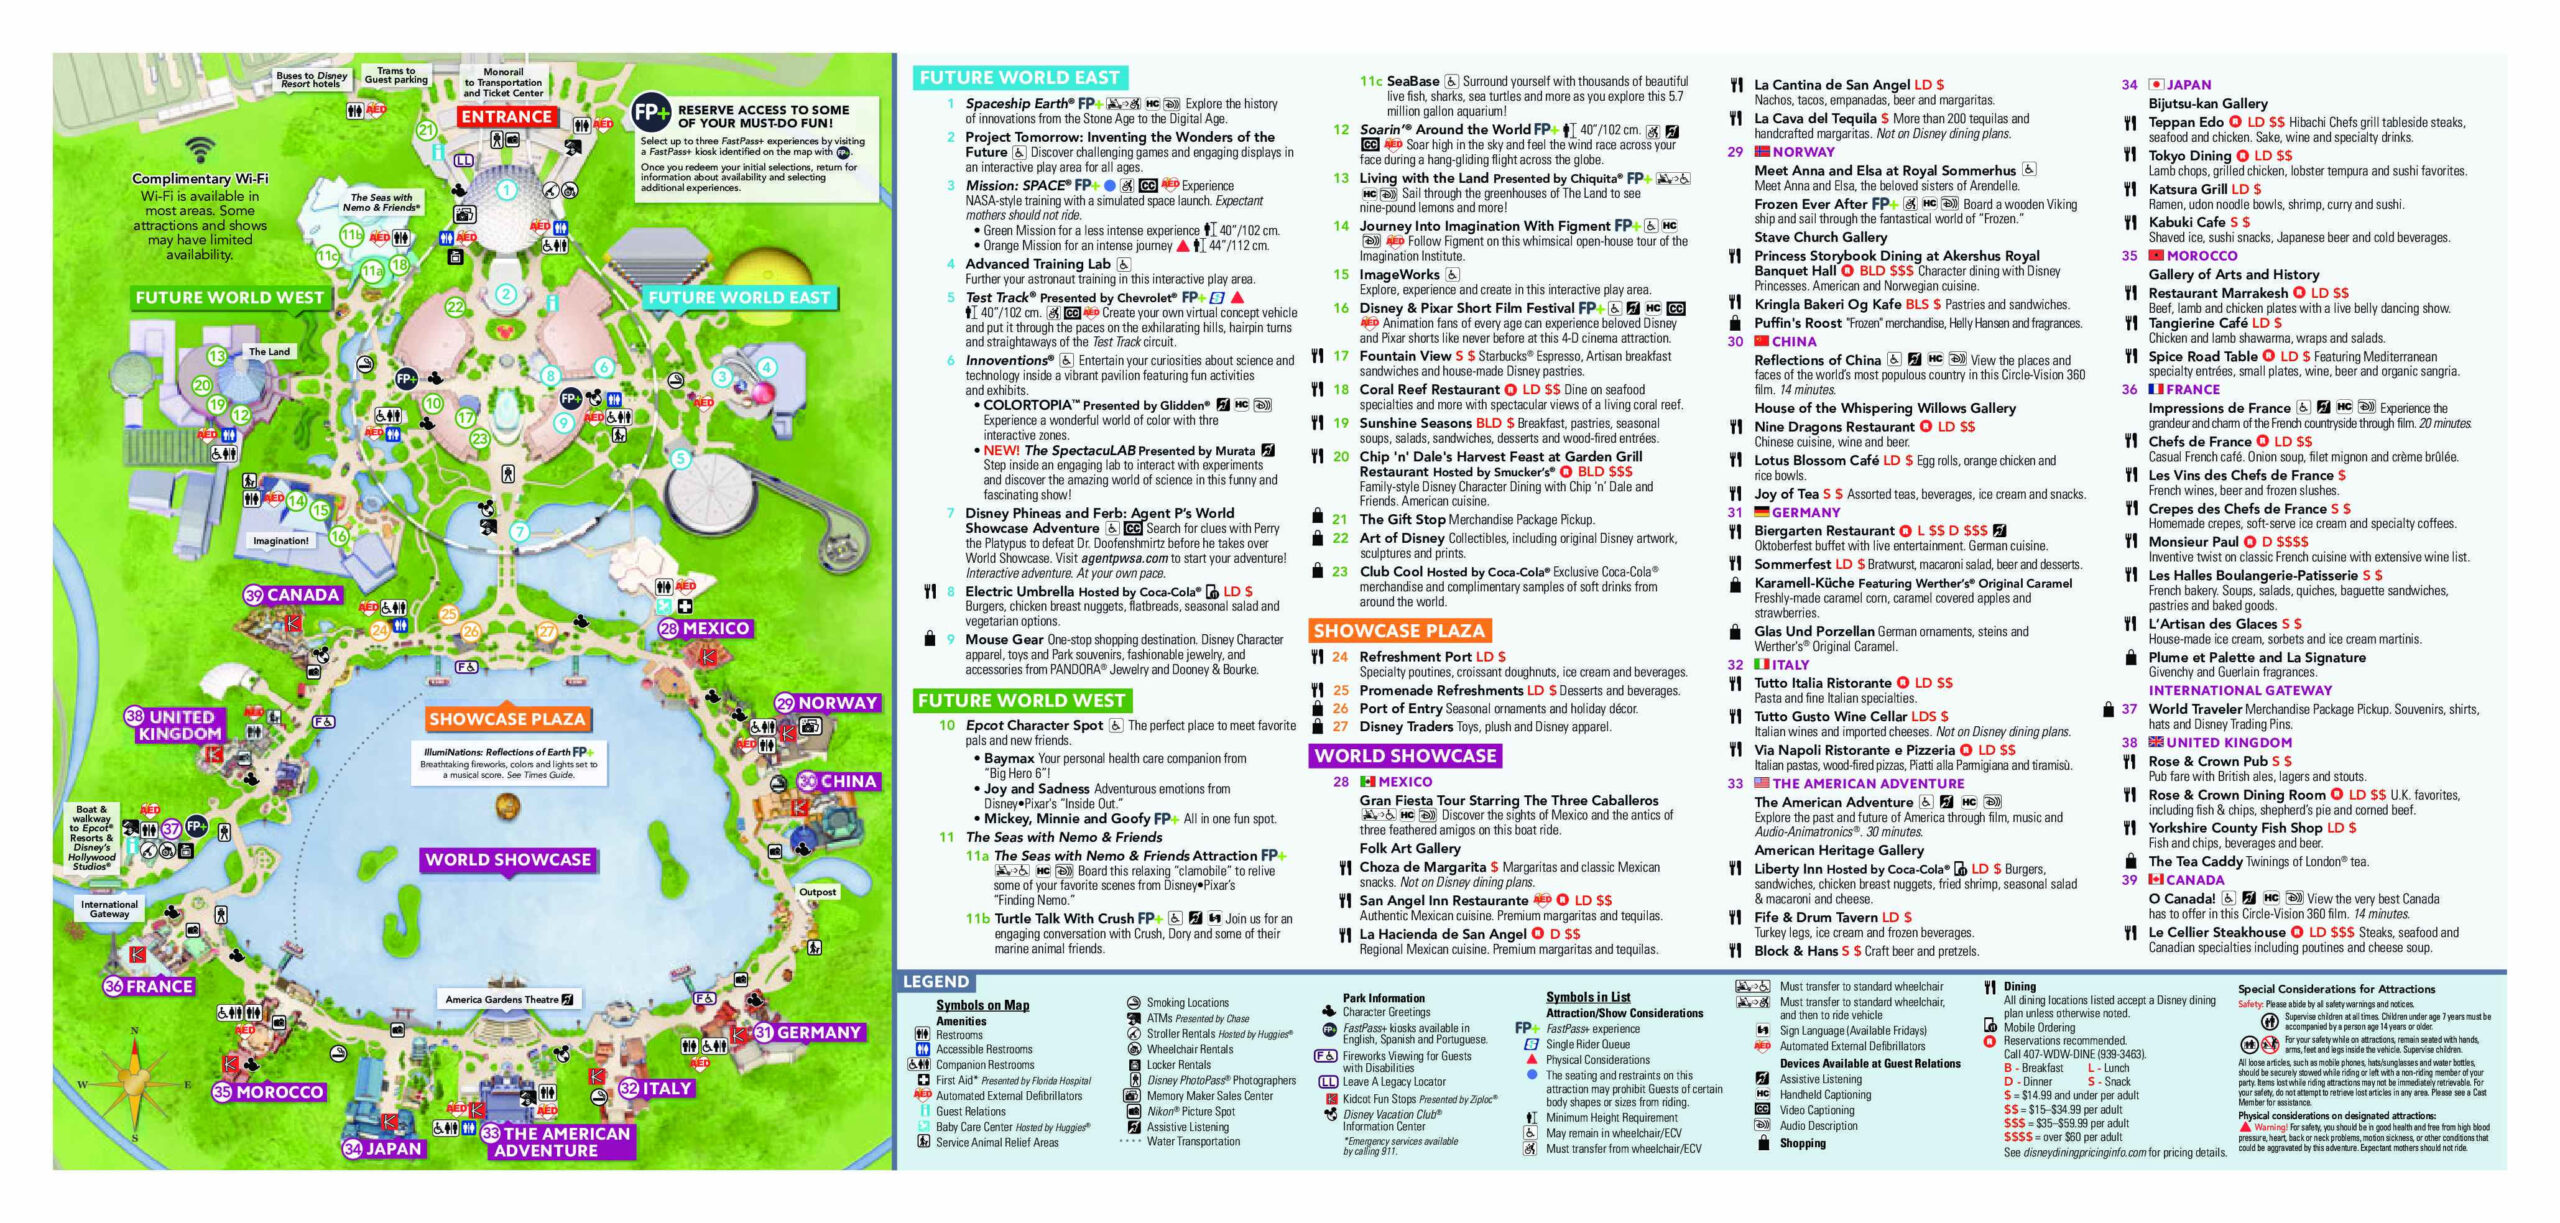 Disney World Maps • Wdw Travels  Disney World Attractions List Pdf